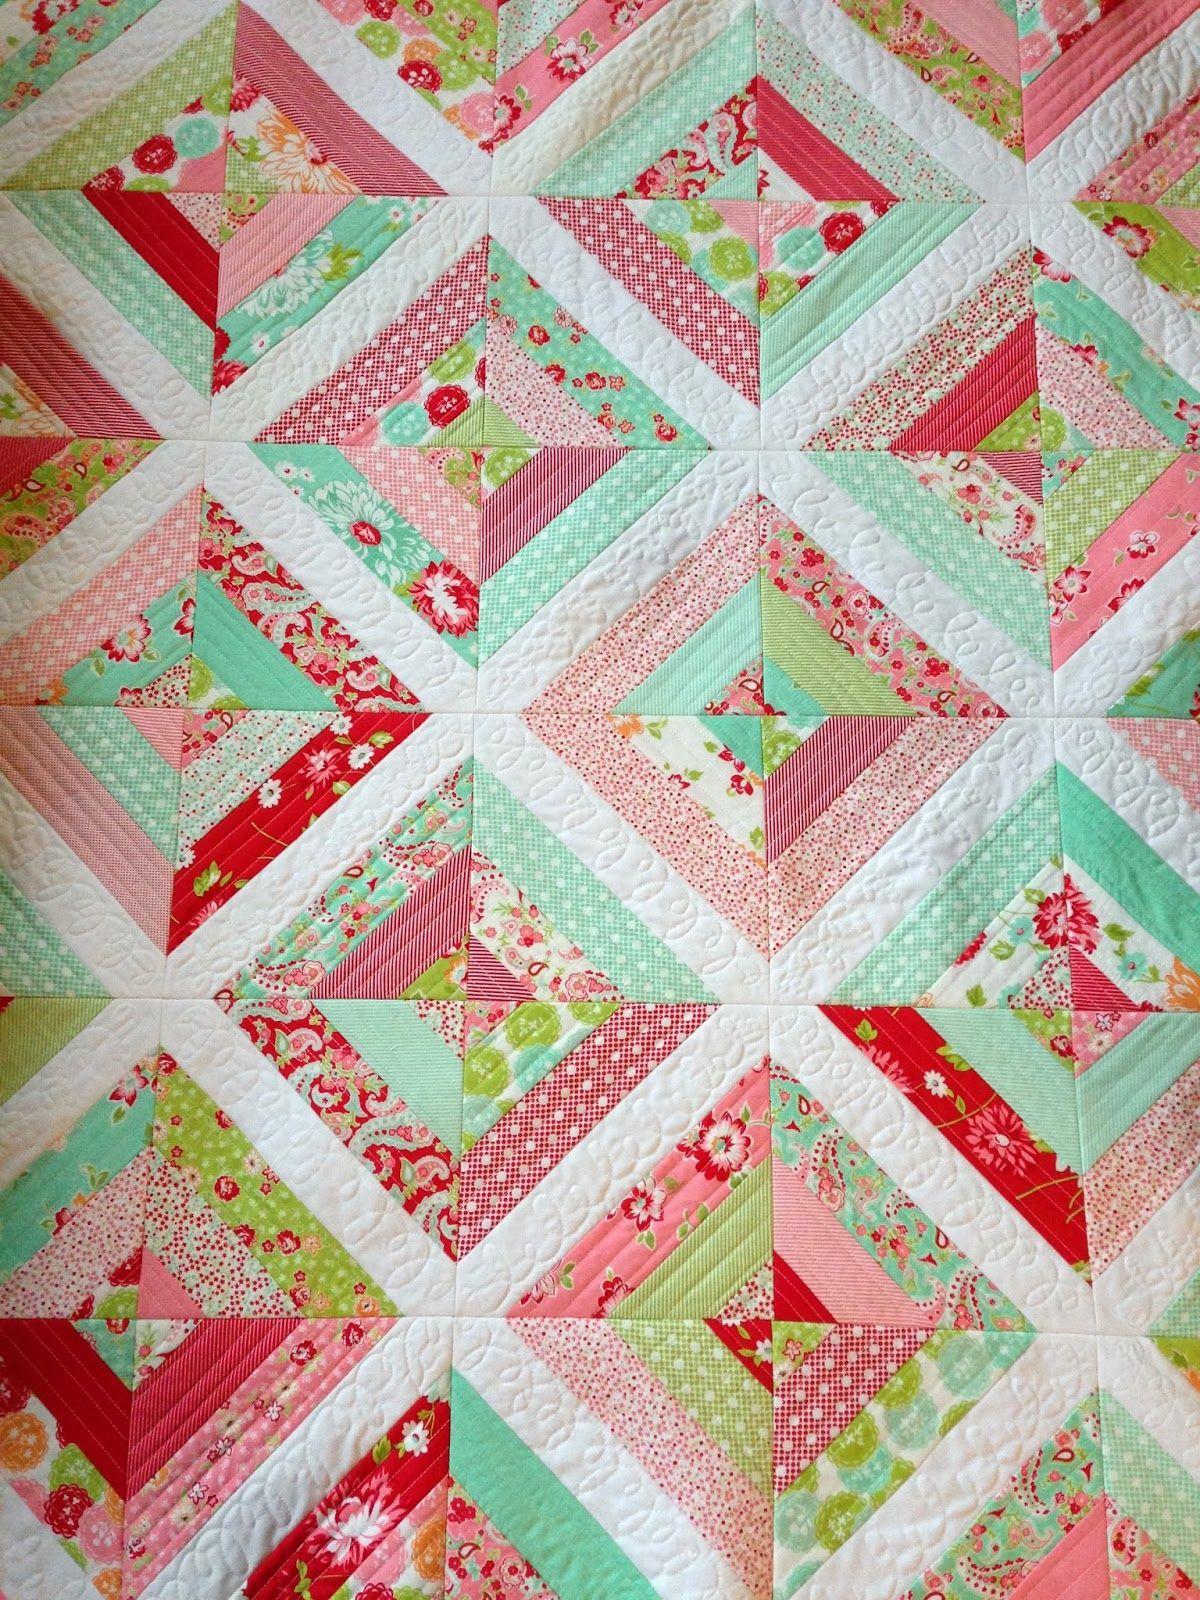 Quilt As You Go Patterns Interesting Design Inspiration